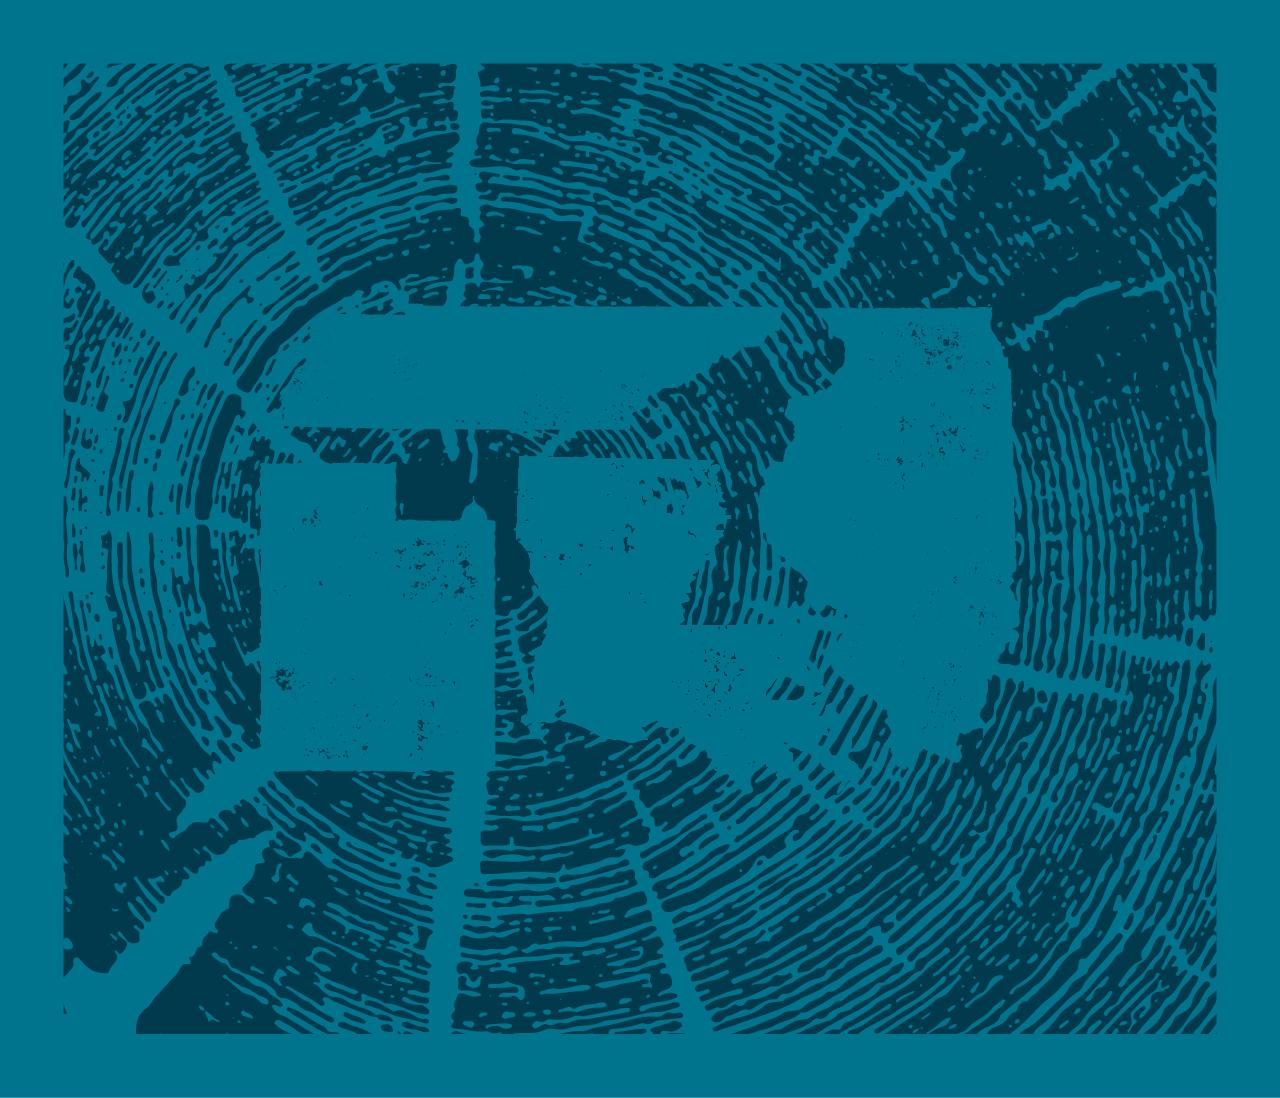 Live_Wholly_Tour_Content_Artboard 23.jpg